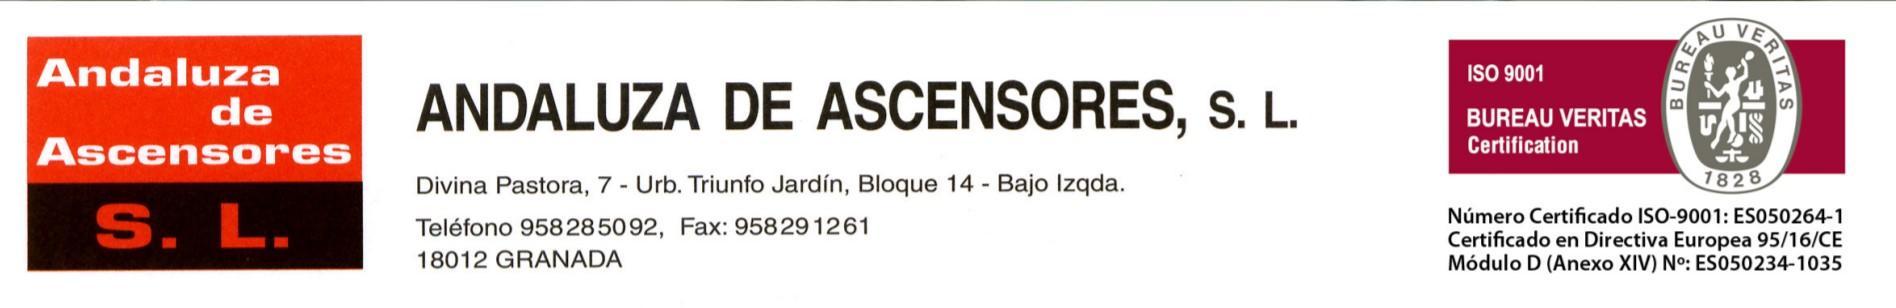 Andaluza de Ascensores, certificada por Bureau Veritas